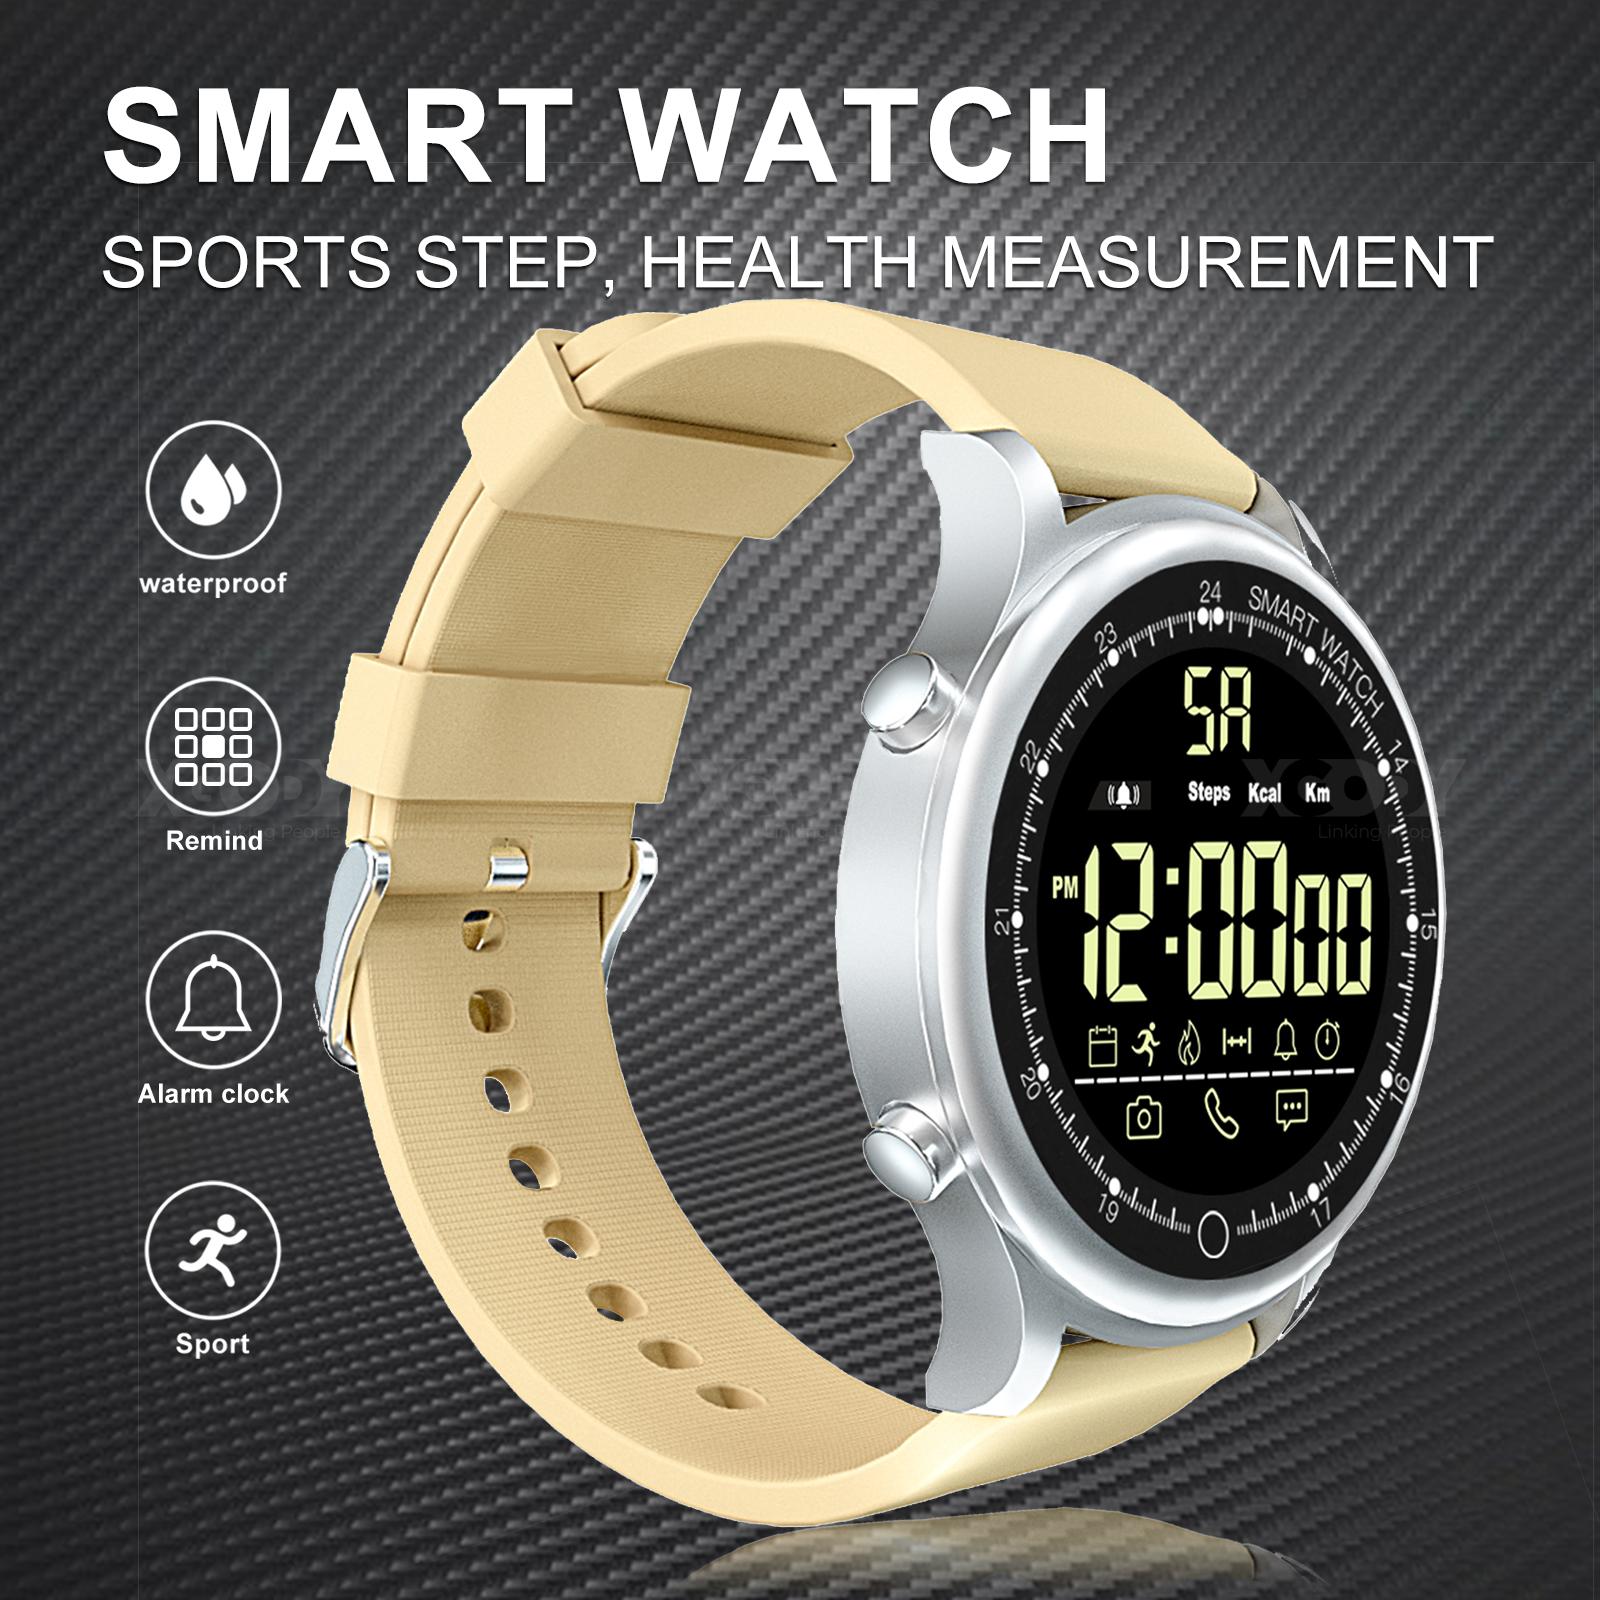 XGODY Waterproof Sport Fitness Smart Watch Activity Tracker